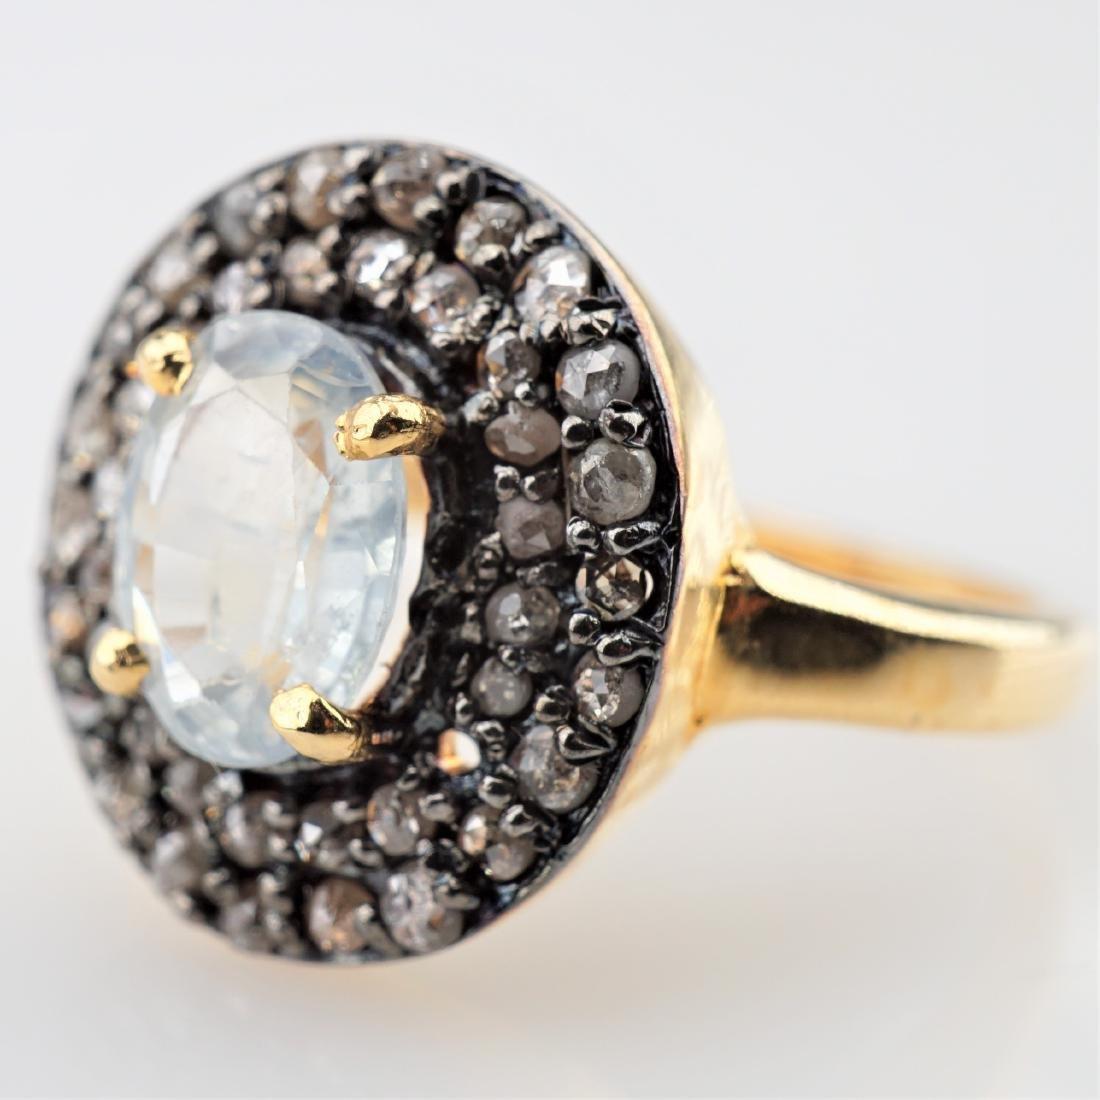 1.87 CT Sapphire Ring .85 CTTW Diamonds sz 6.75